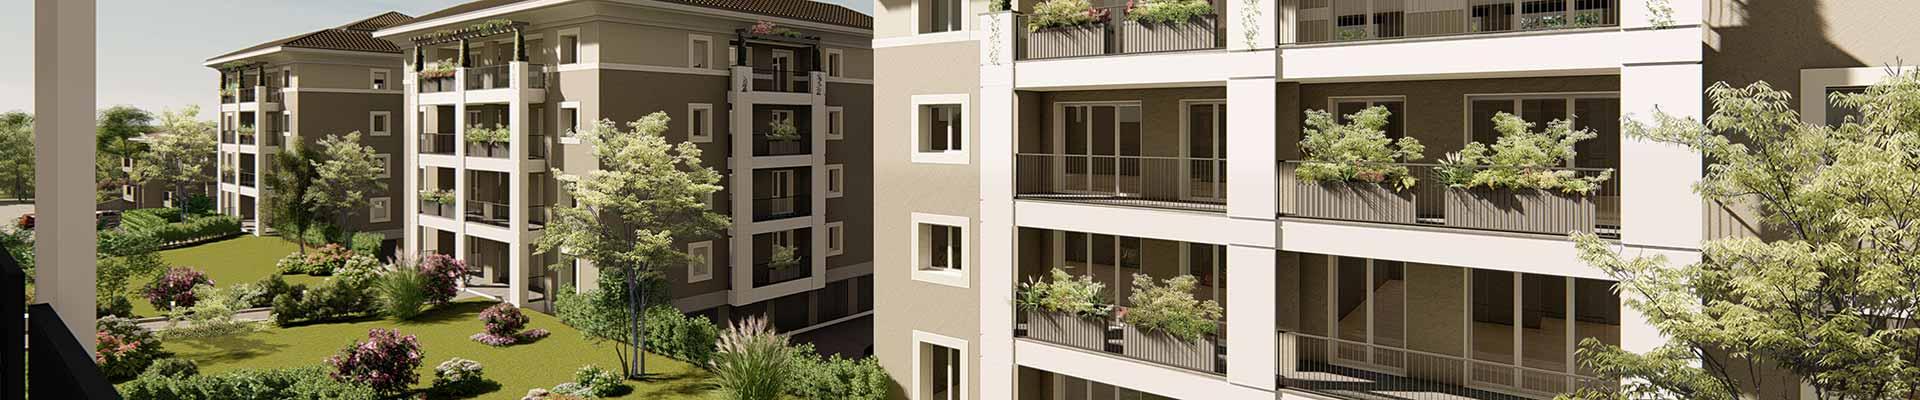 Residenza Cascina Gaita Planimetrie header